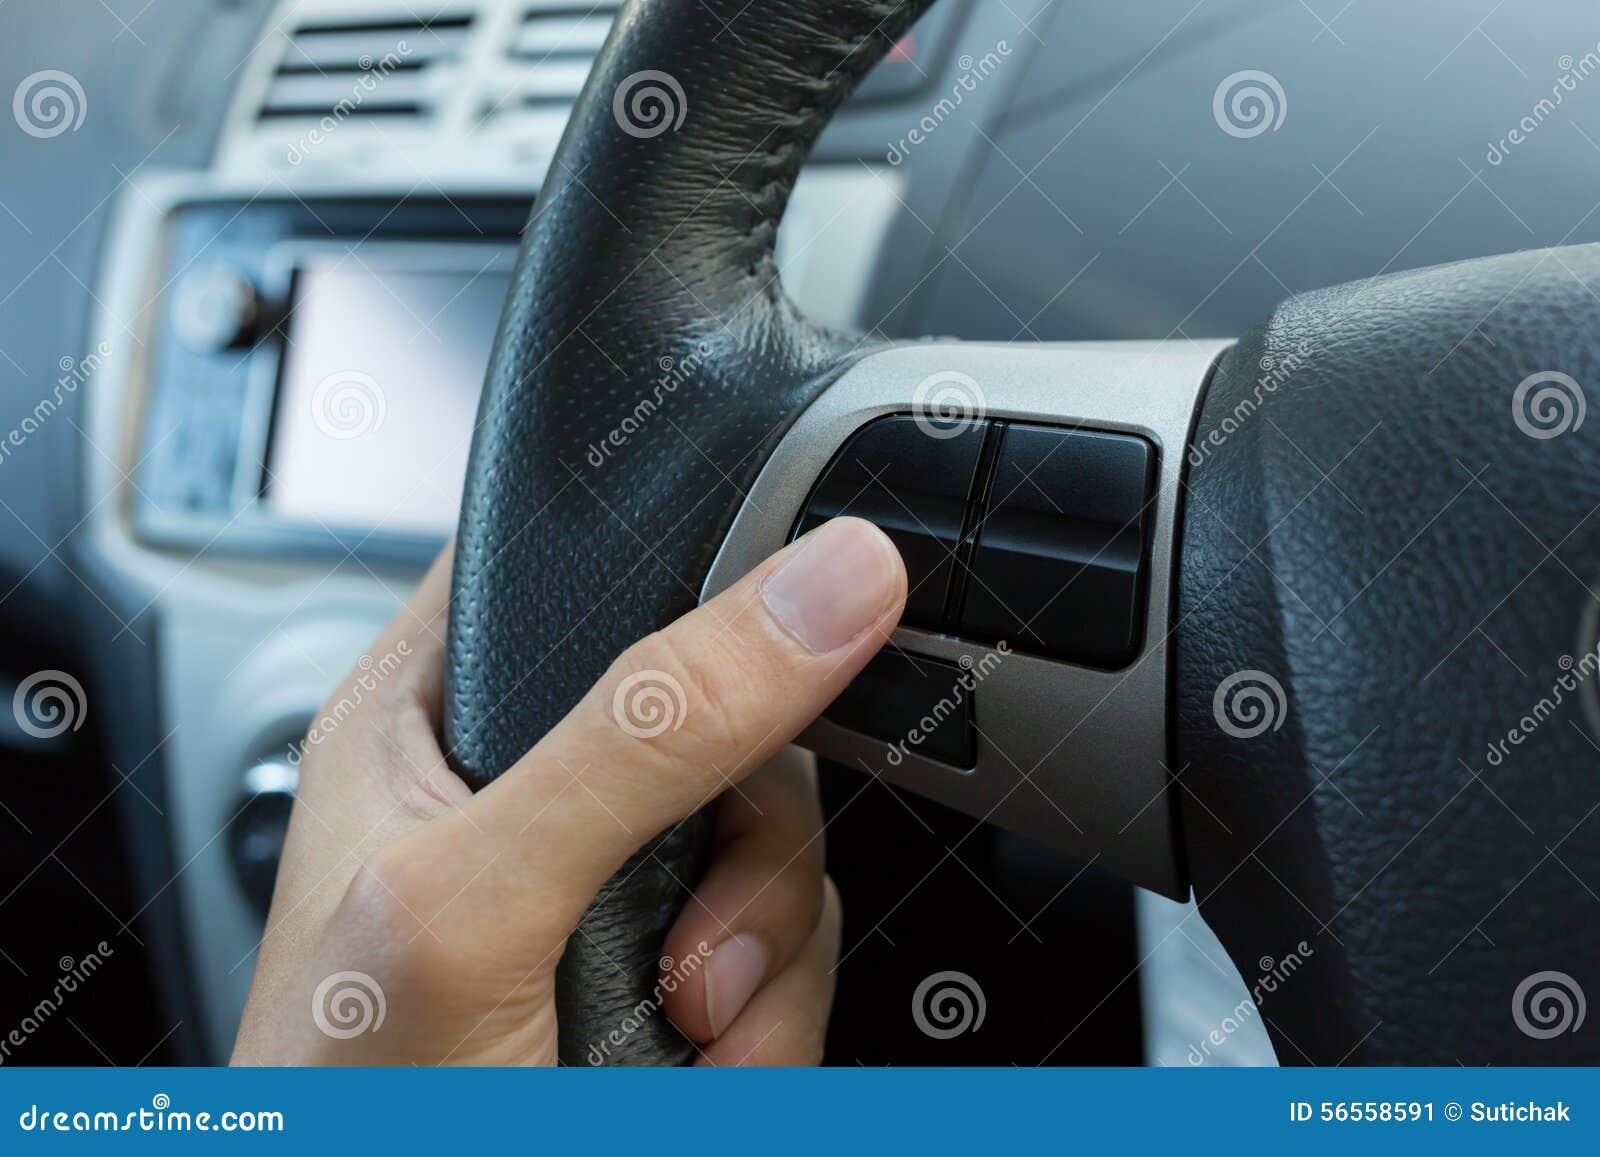 Download Κενό κουμπί ελέγχου στο τιμόνι αυτοκινήτων χρησιμοποιούμενο Στοκ Εικόνα - εικόνα από επιβραδυνθείτε, άνεση: 56558591